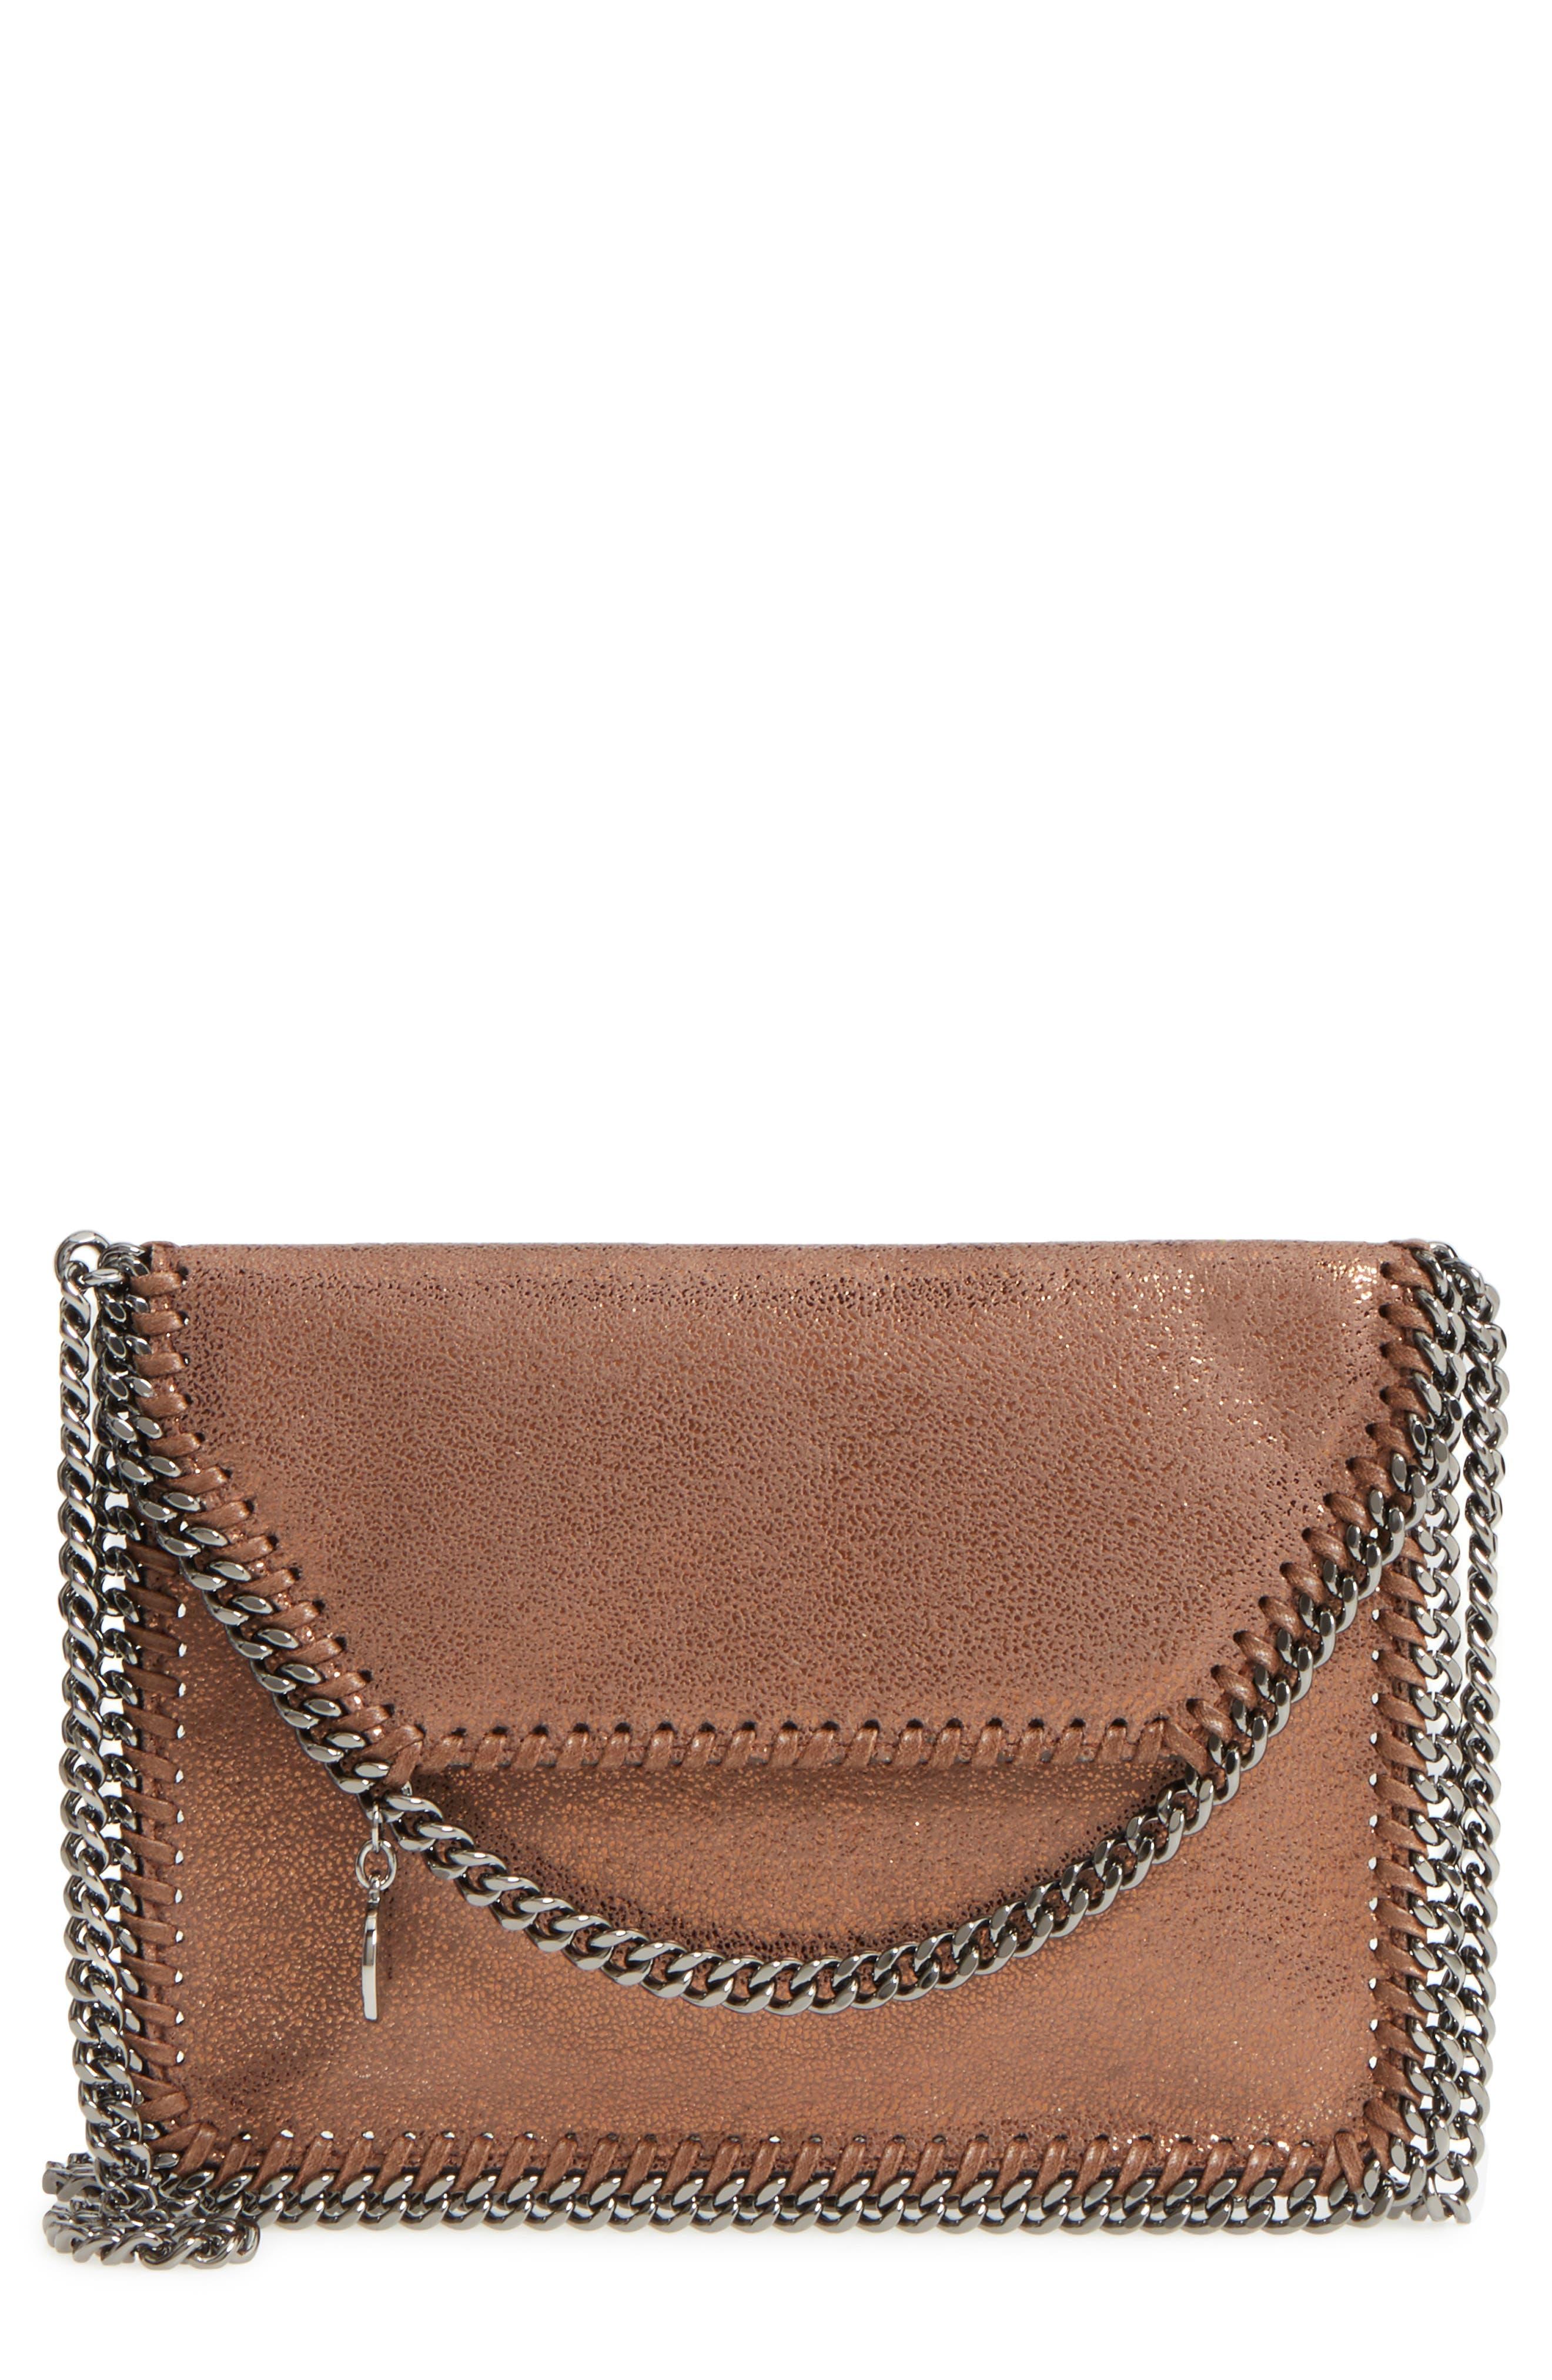 Metallic Faux Leather Crossbody Bag,                         Main,                         color, 200